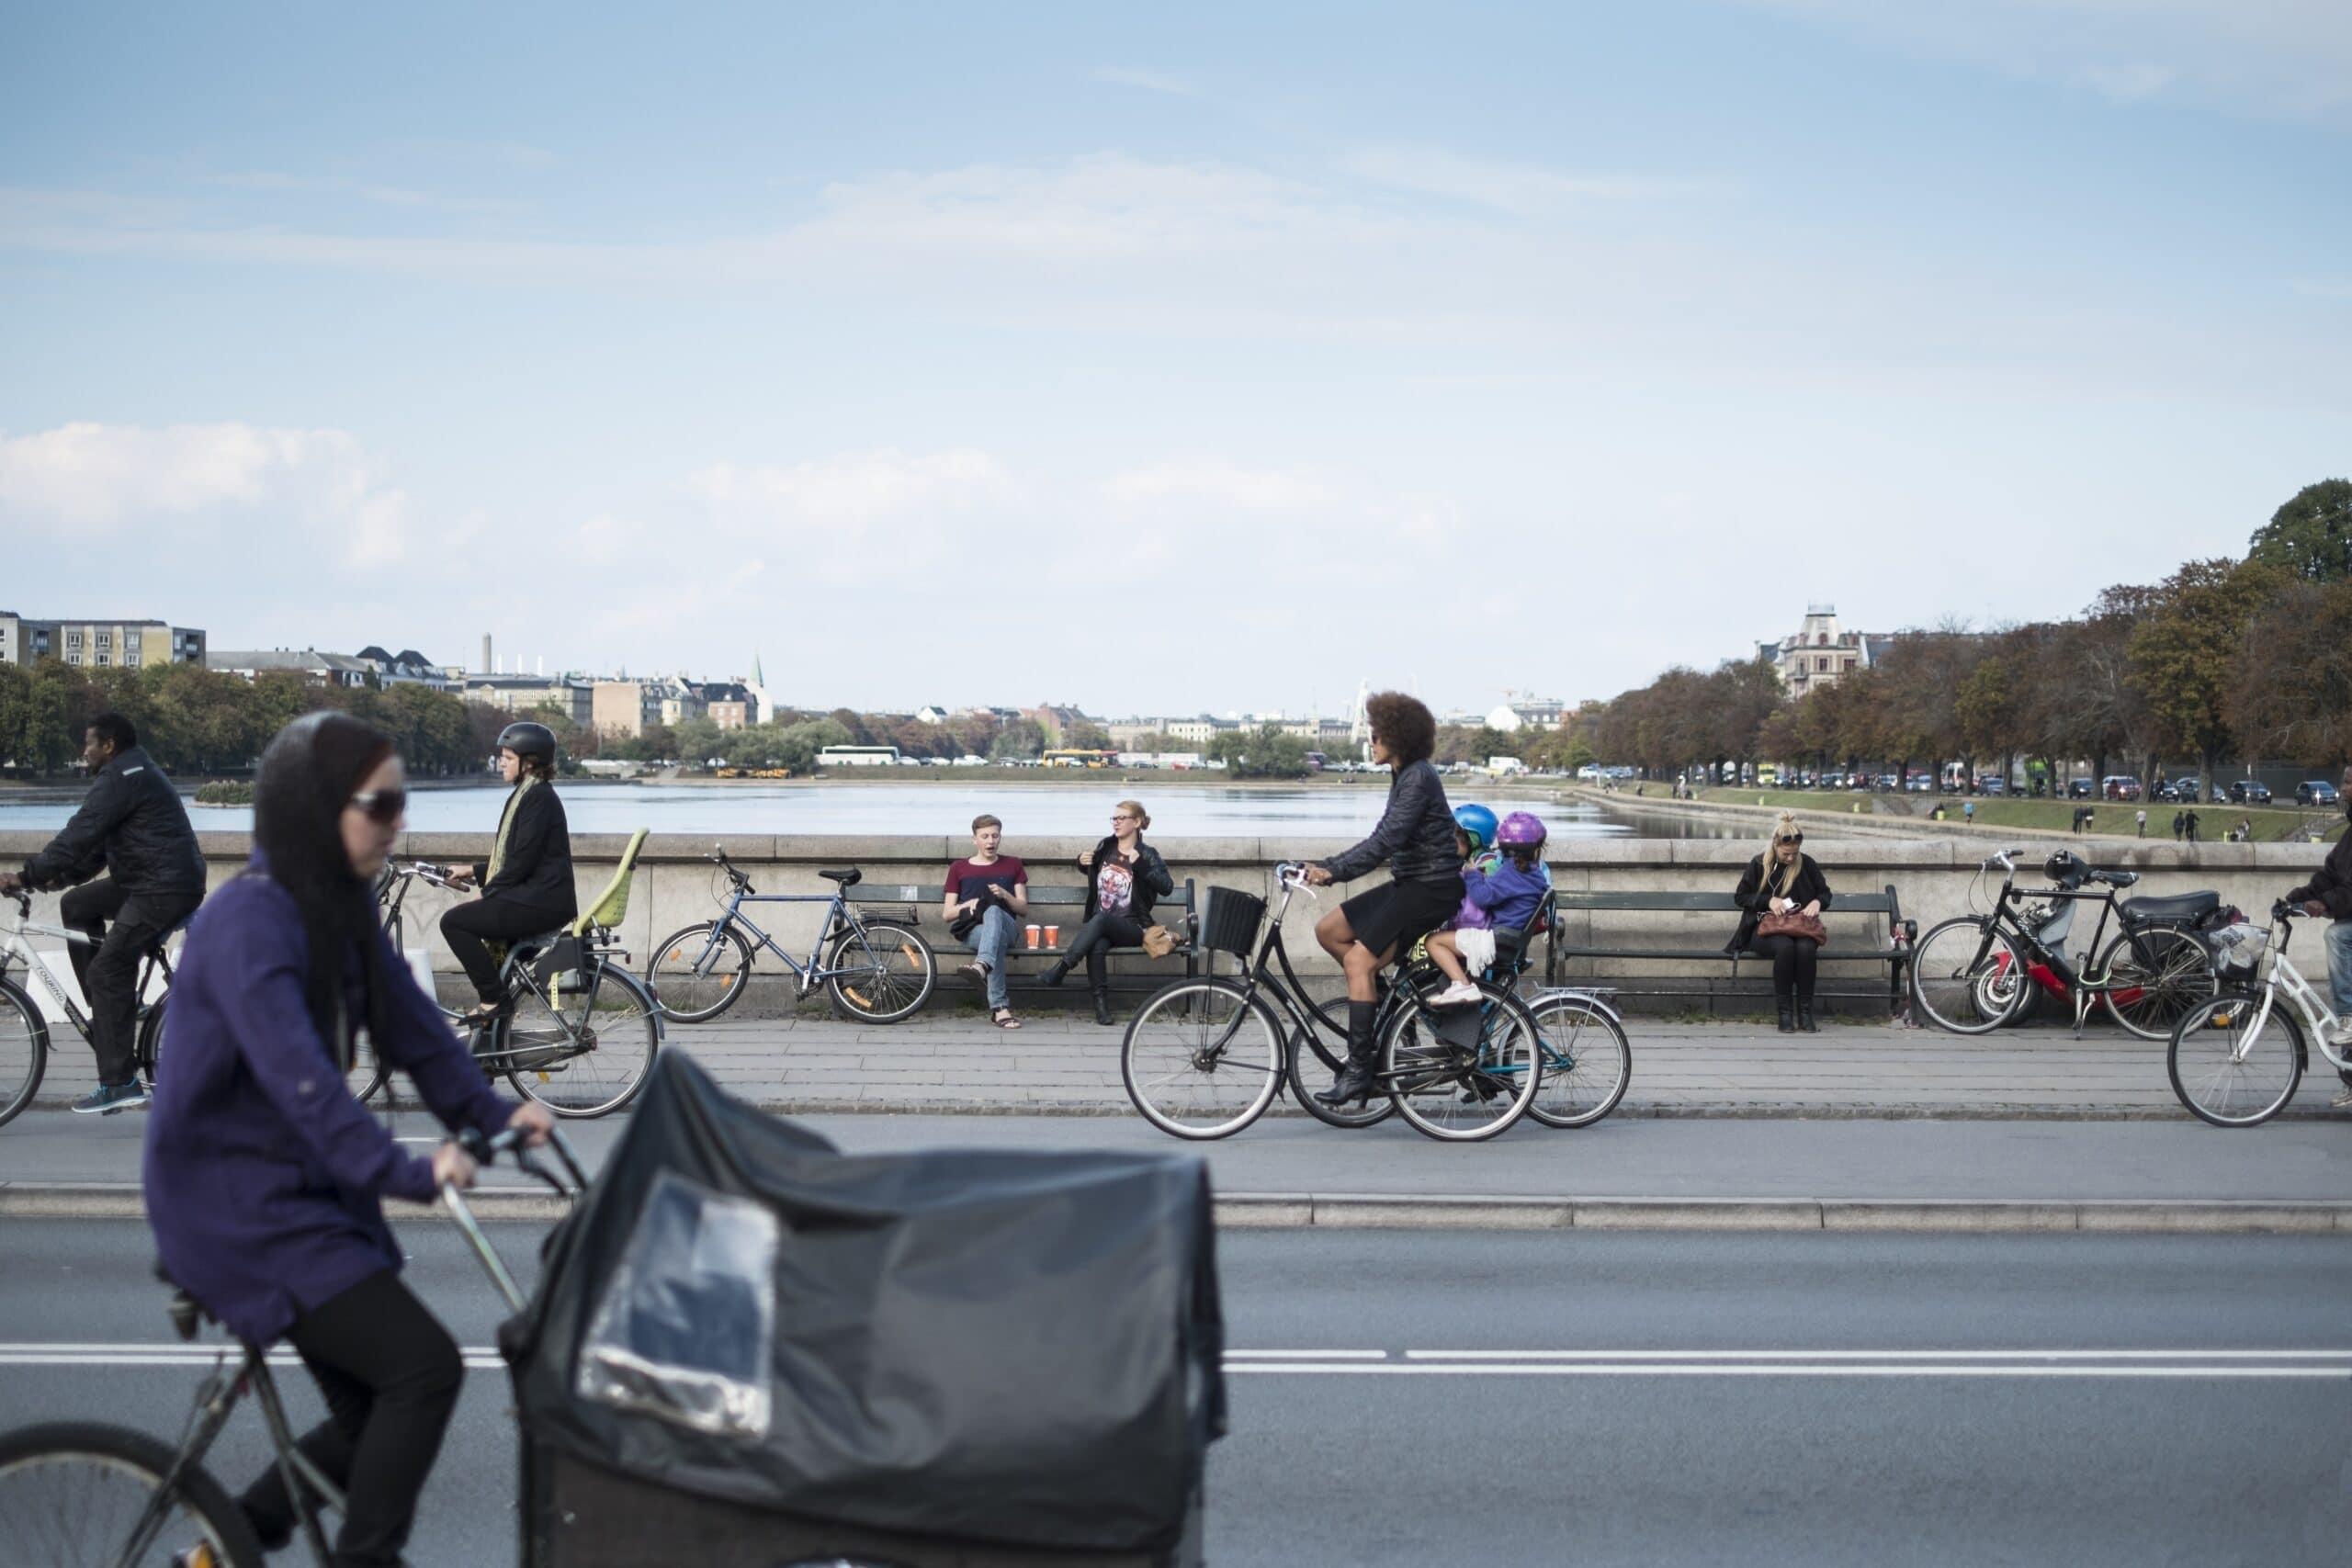 Cycling along the lakes: Nicolai Perjesi